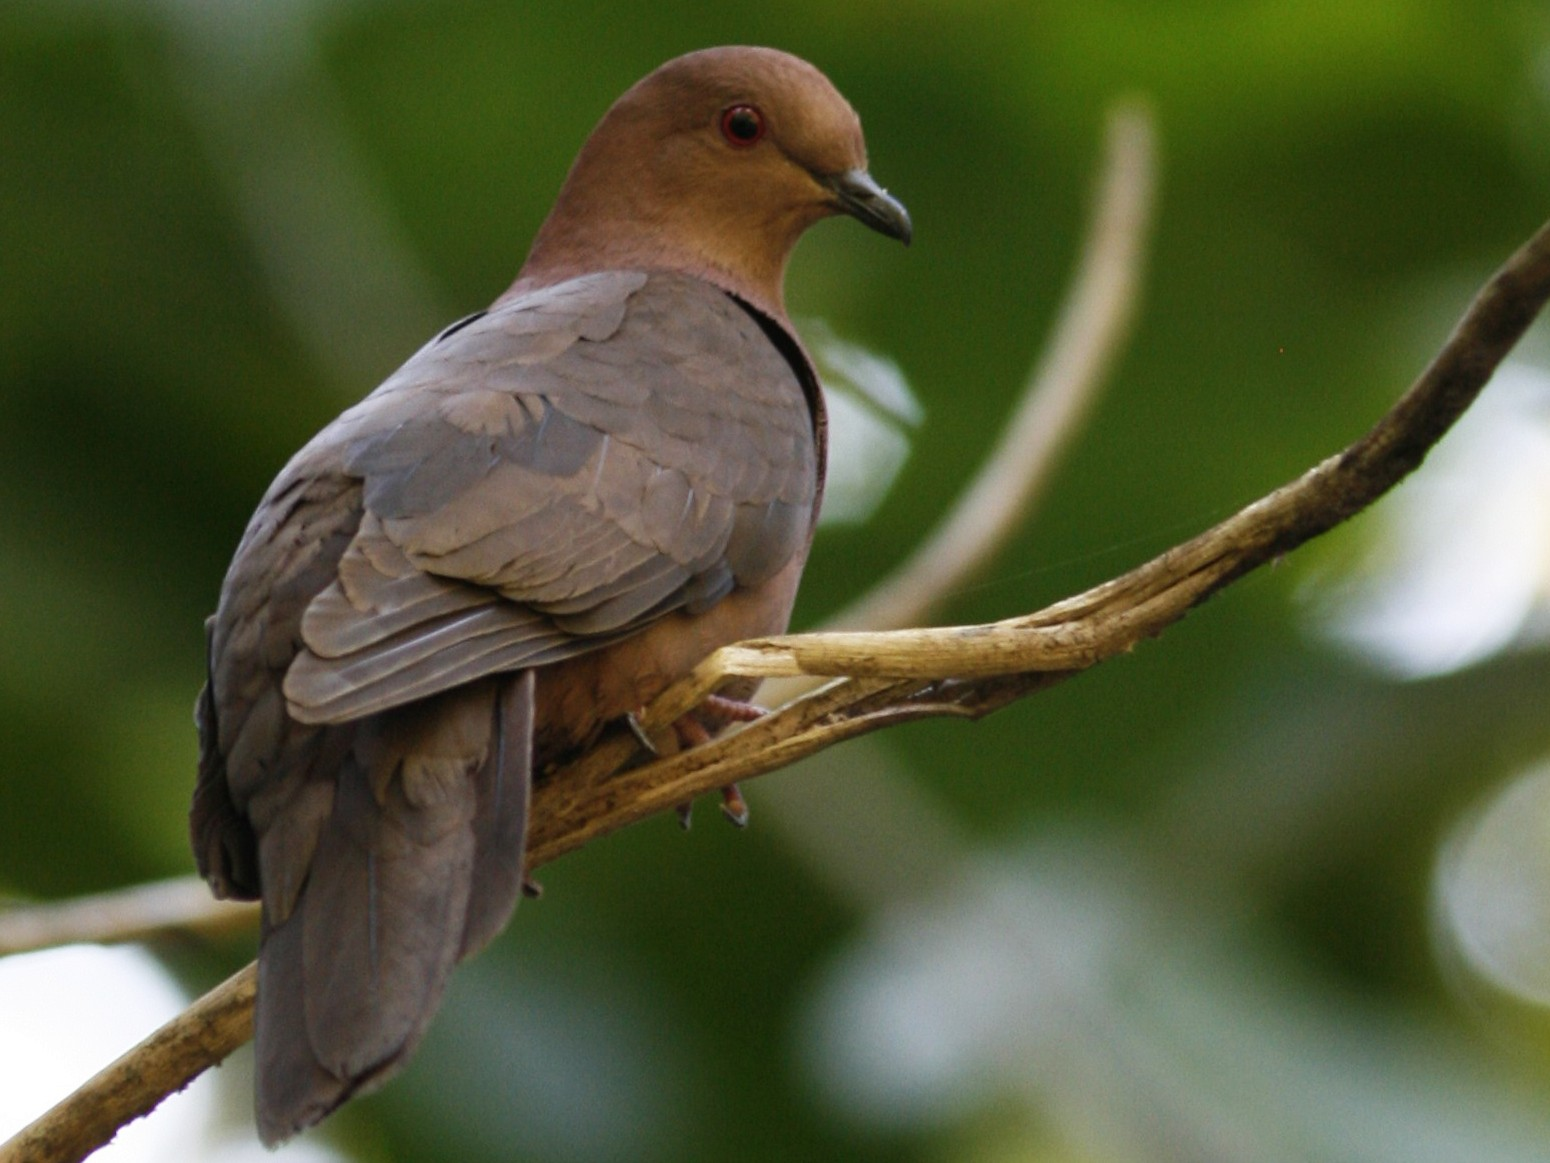 Short-billed Pigeon - Oscar Johnson